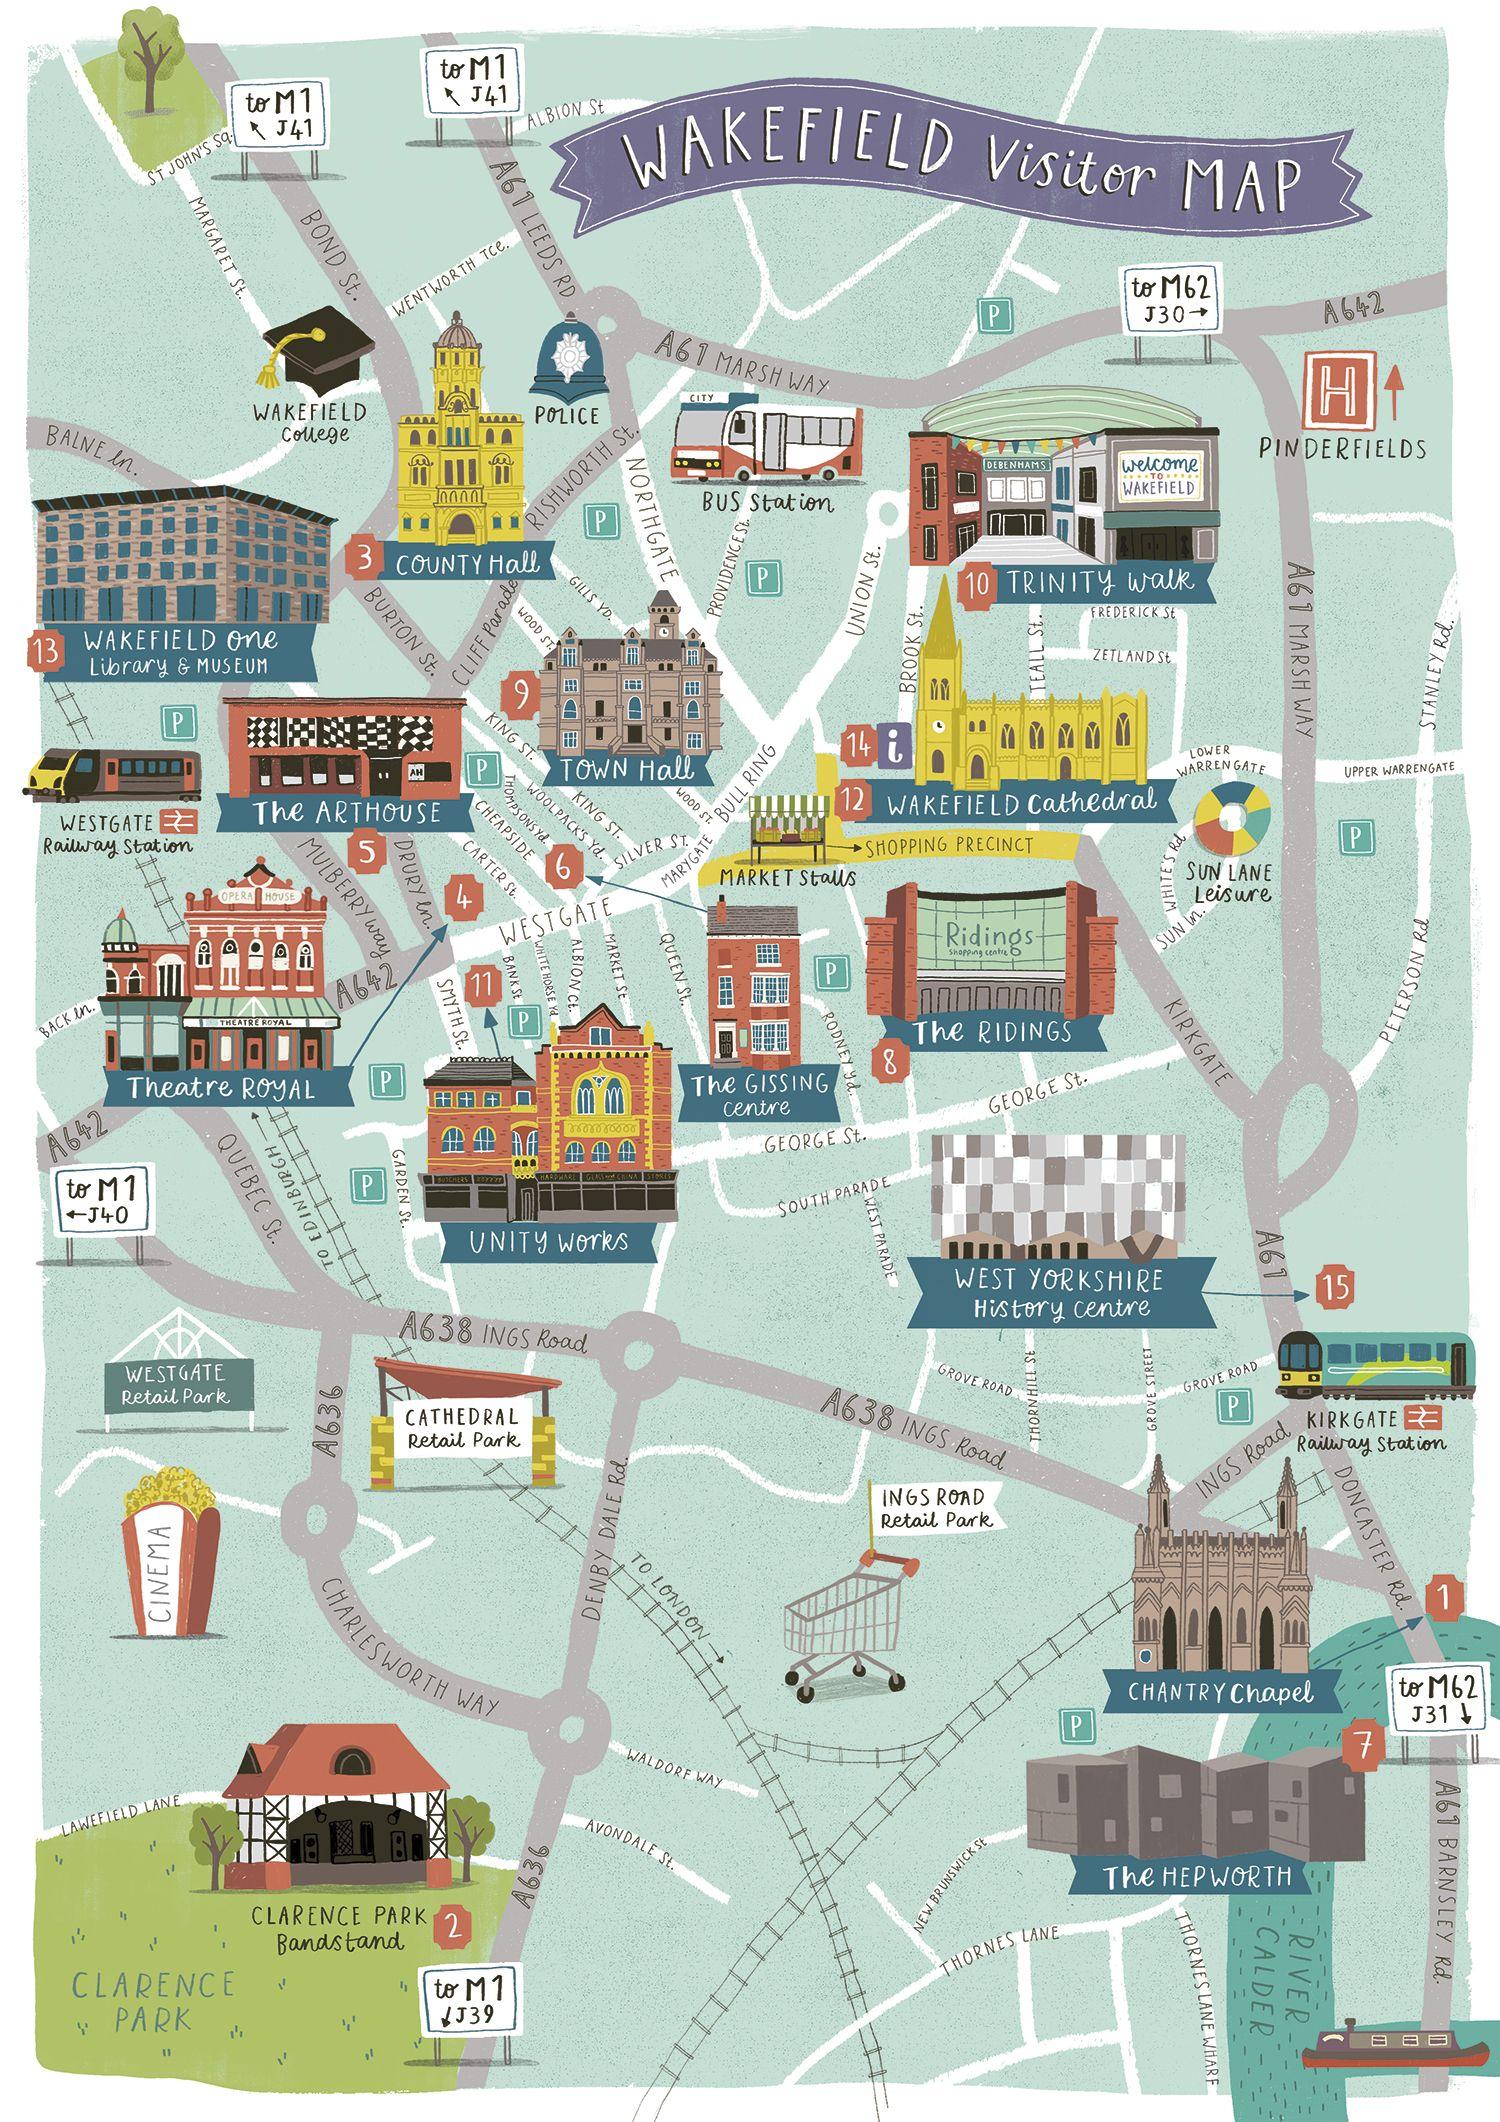 Wakefield Visitor Map lizkaycouk My work Pinterest